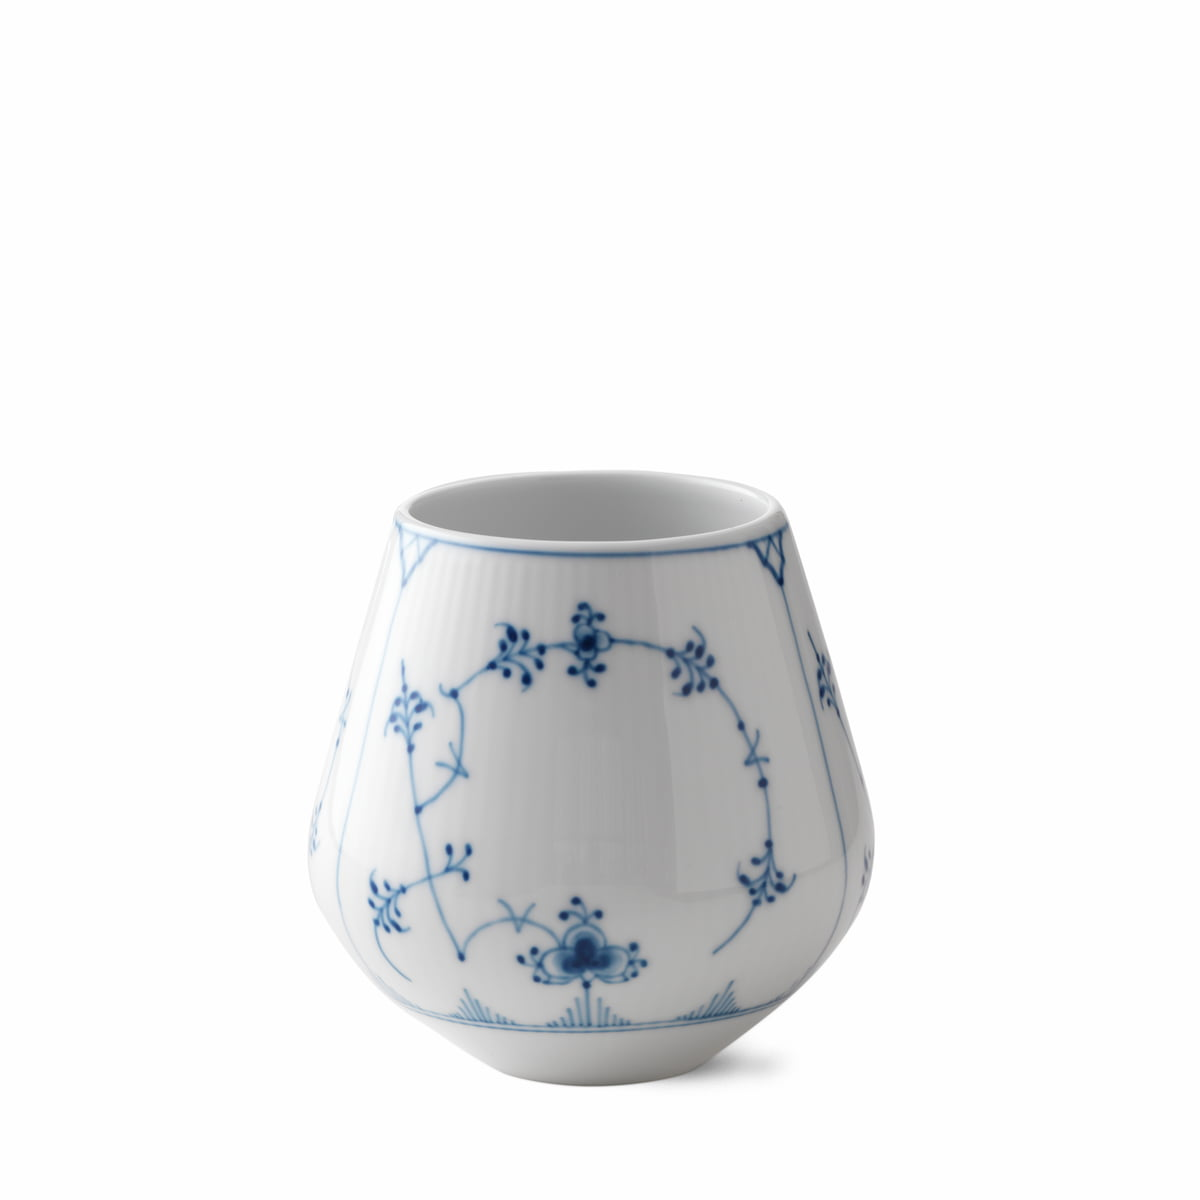 royal copenhagen musselmalet vase